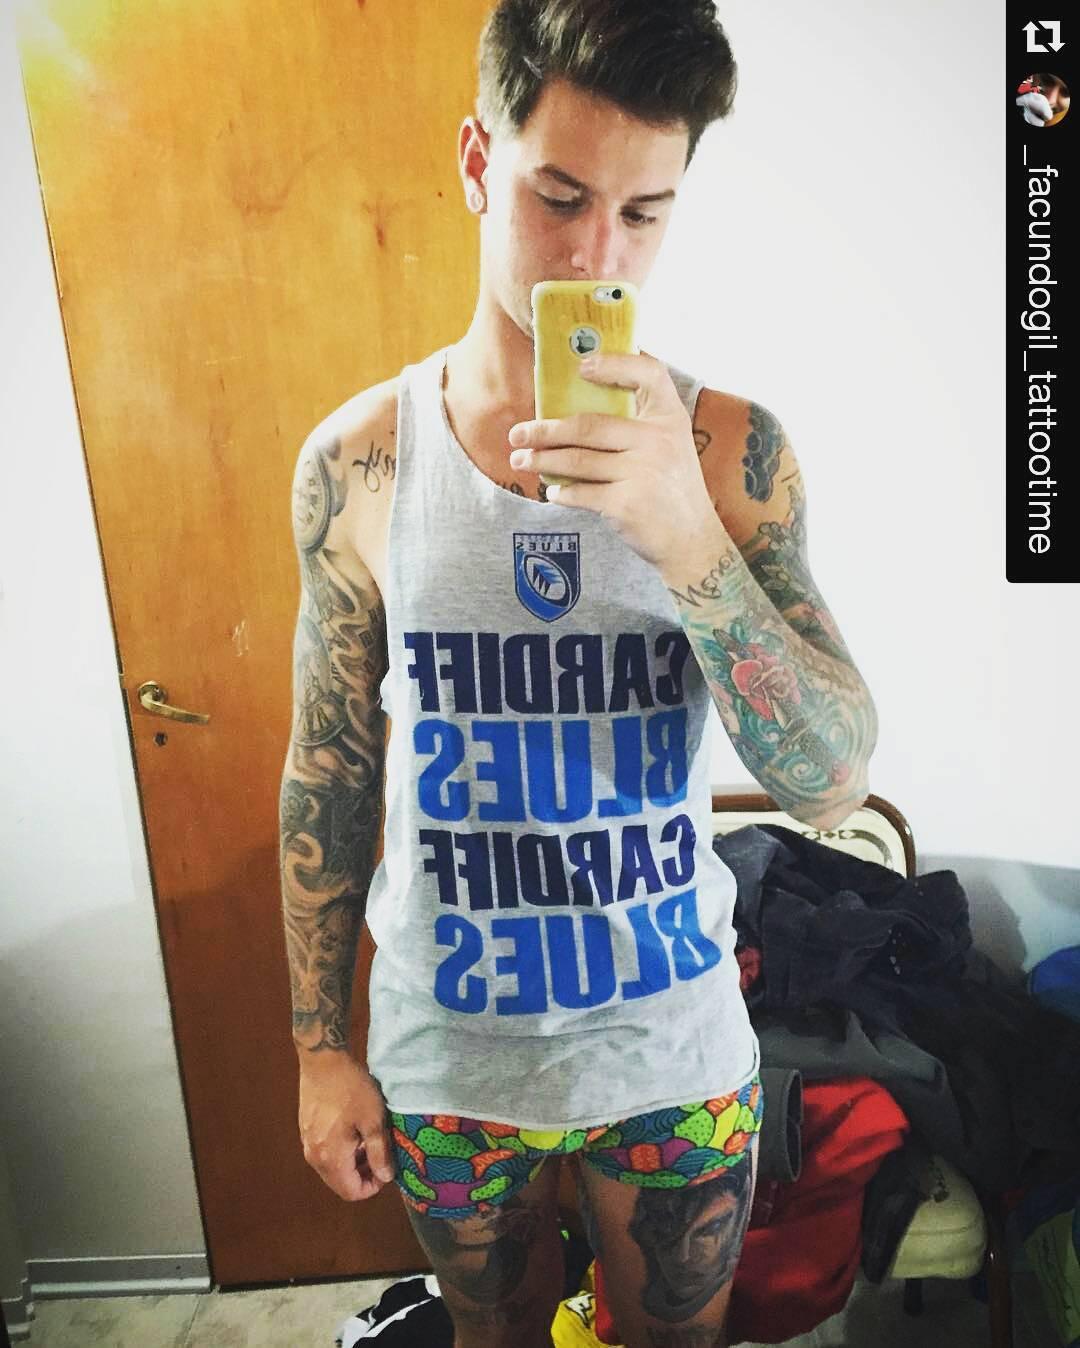 Ponete cómodo Usá GILIPOLLAS ® #Underwear #Man #Boxer #BuenaVida #Lifestyle #CoolBoxer #Style #Rider #tattoo #Gilipollas